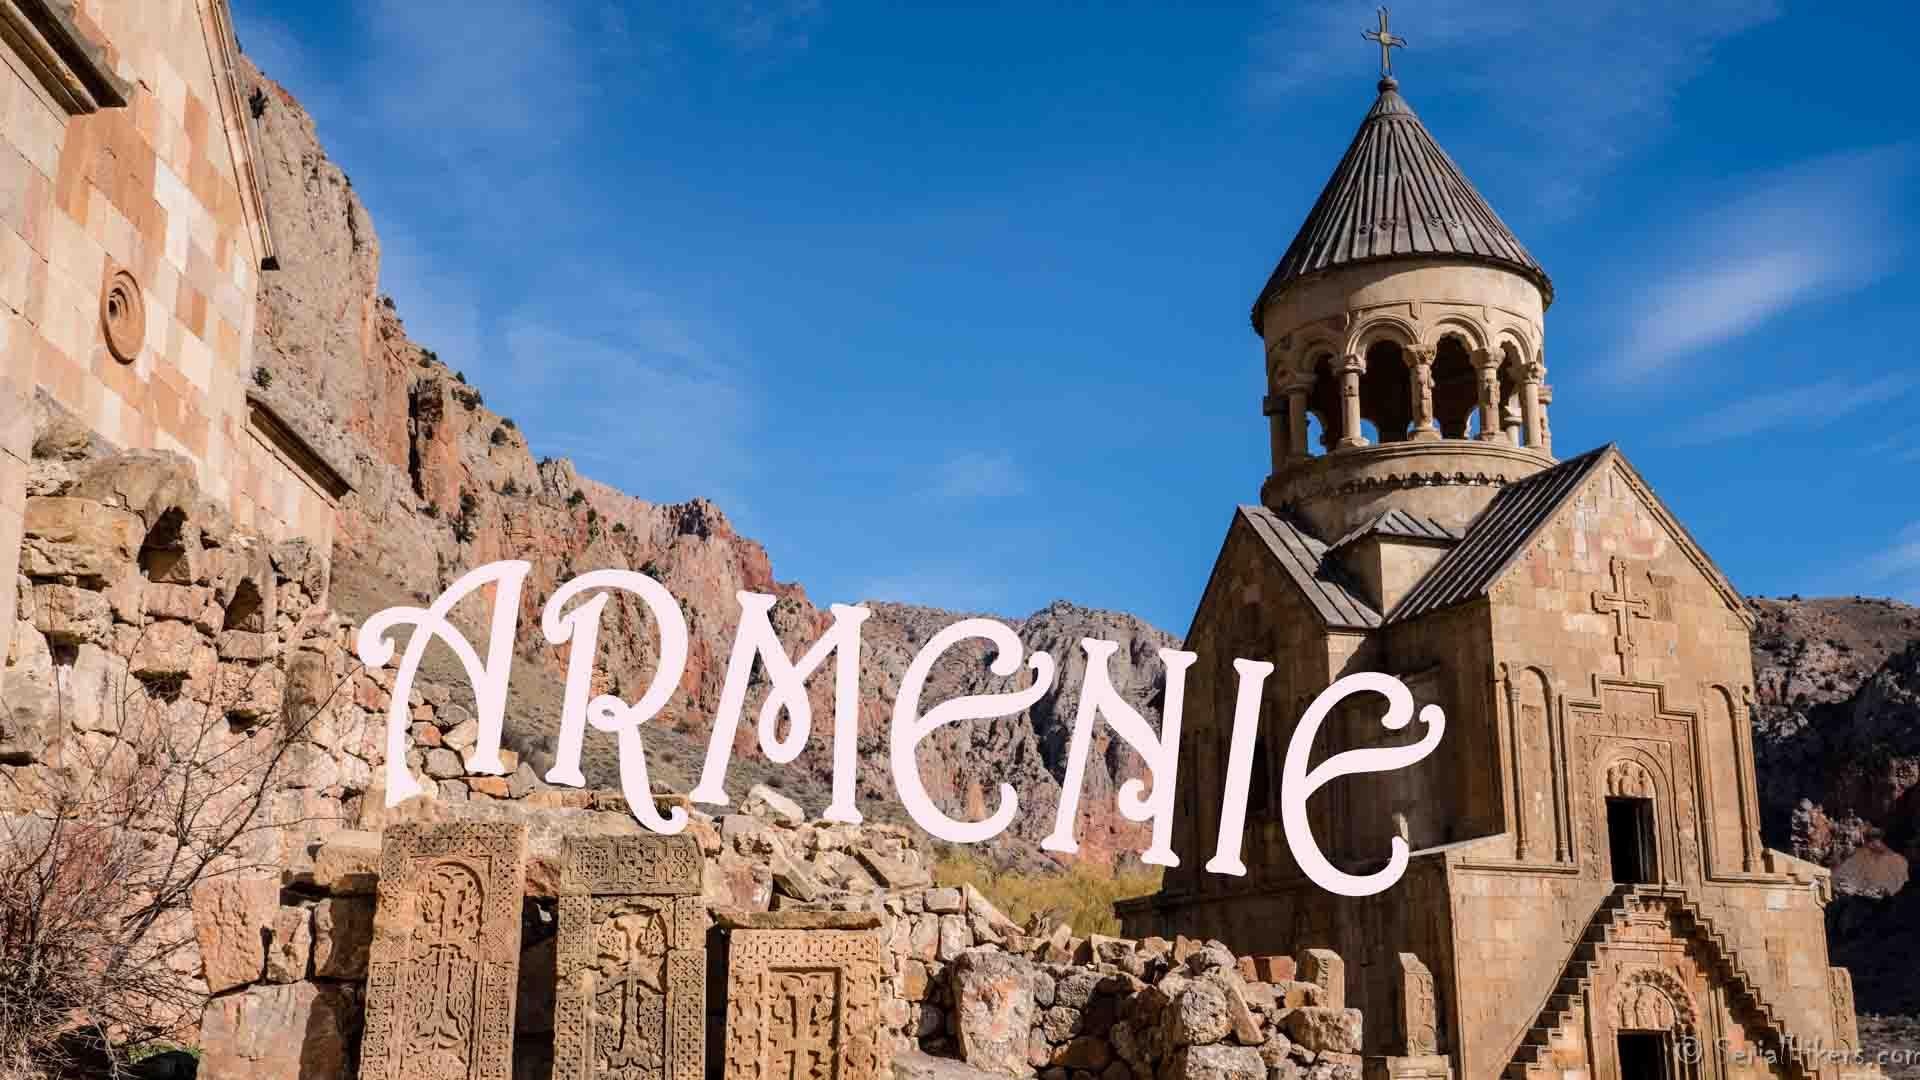 SerialHikers stop autostop world monde tour hitchhiking aventure adventure alternative travel voyage sans avion no fly caucase armenia armenie monastery monastère